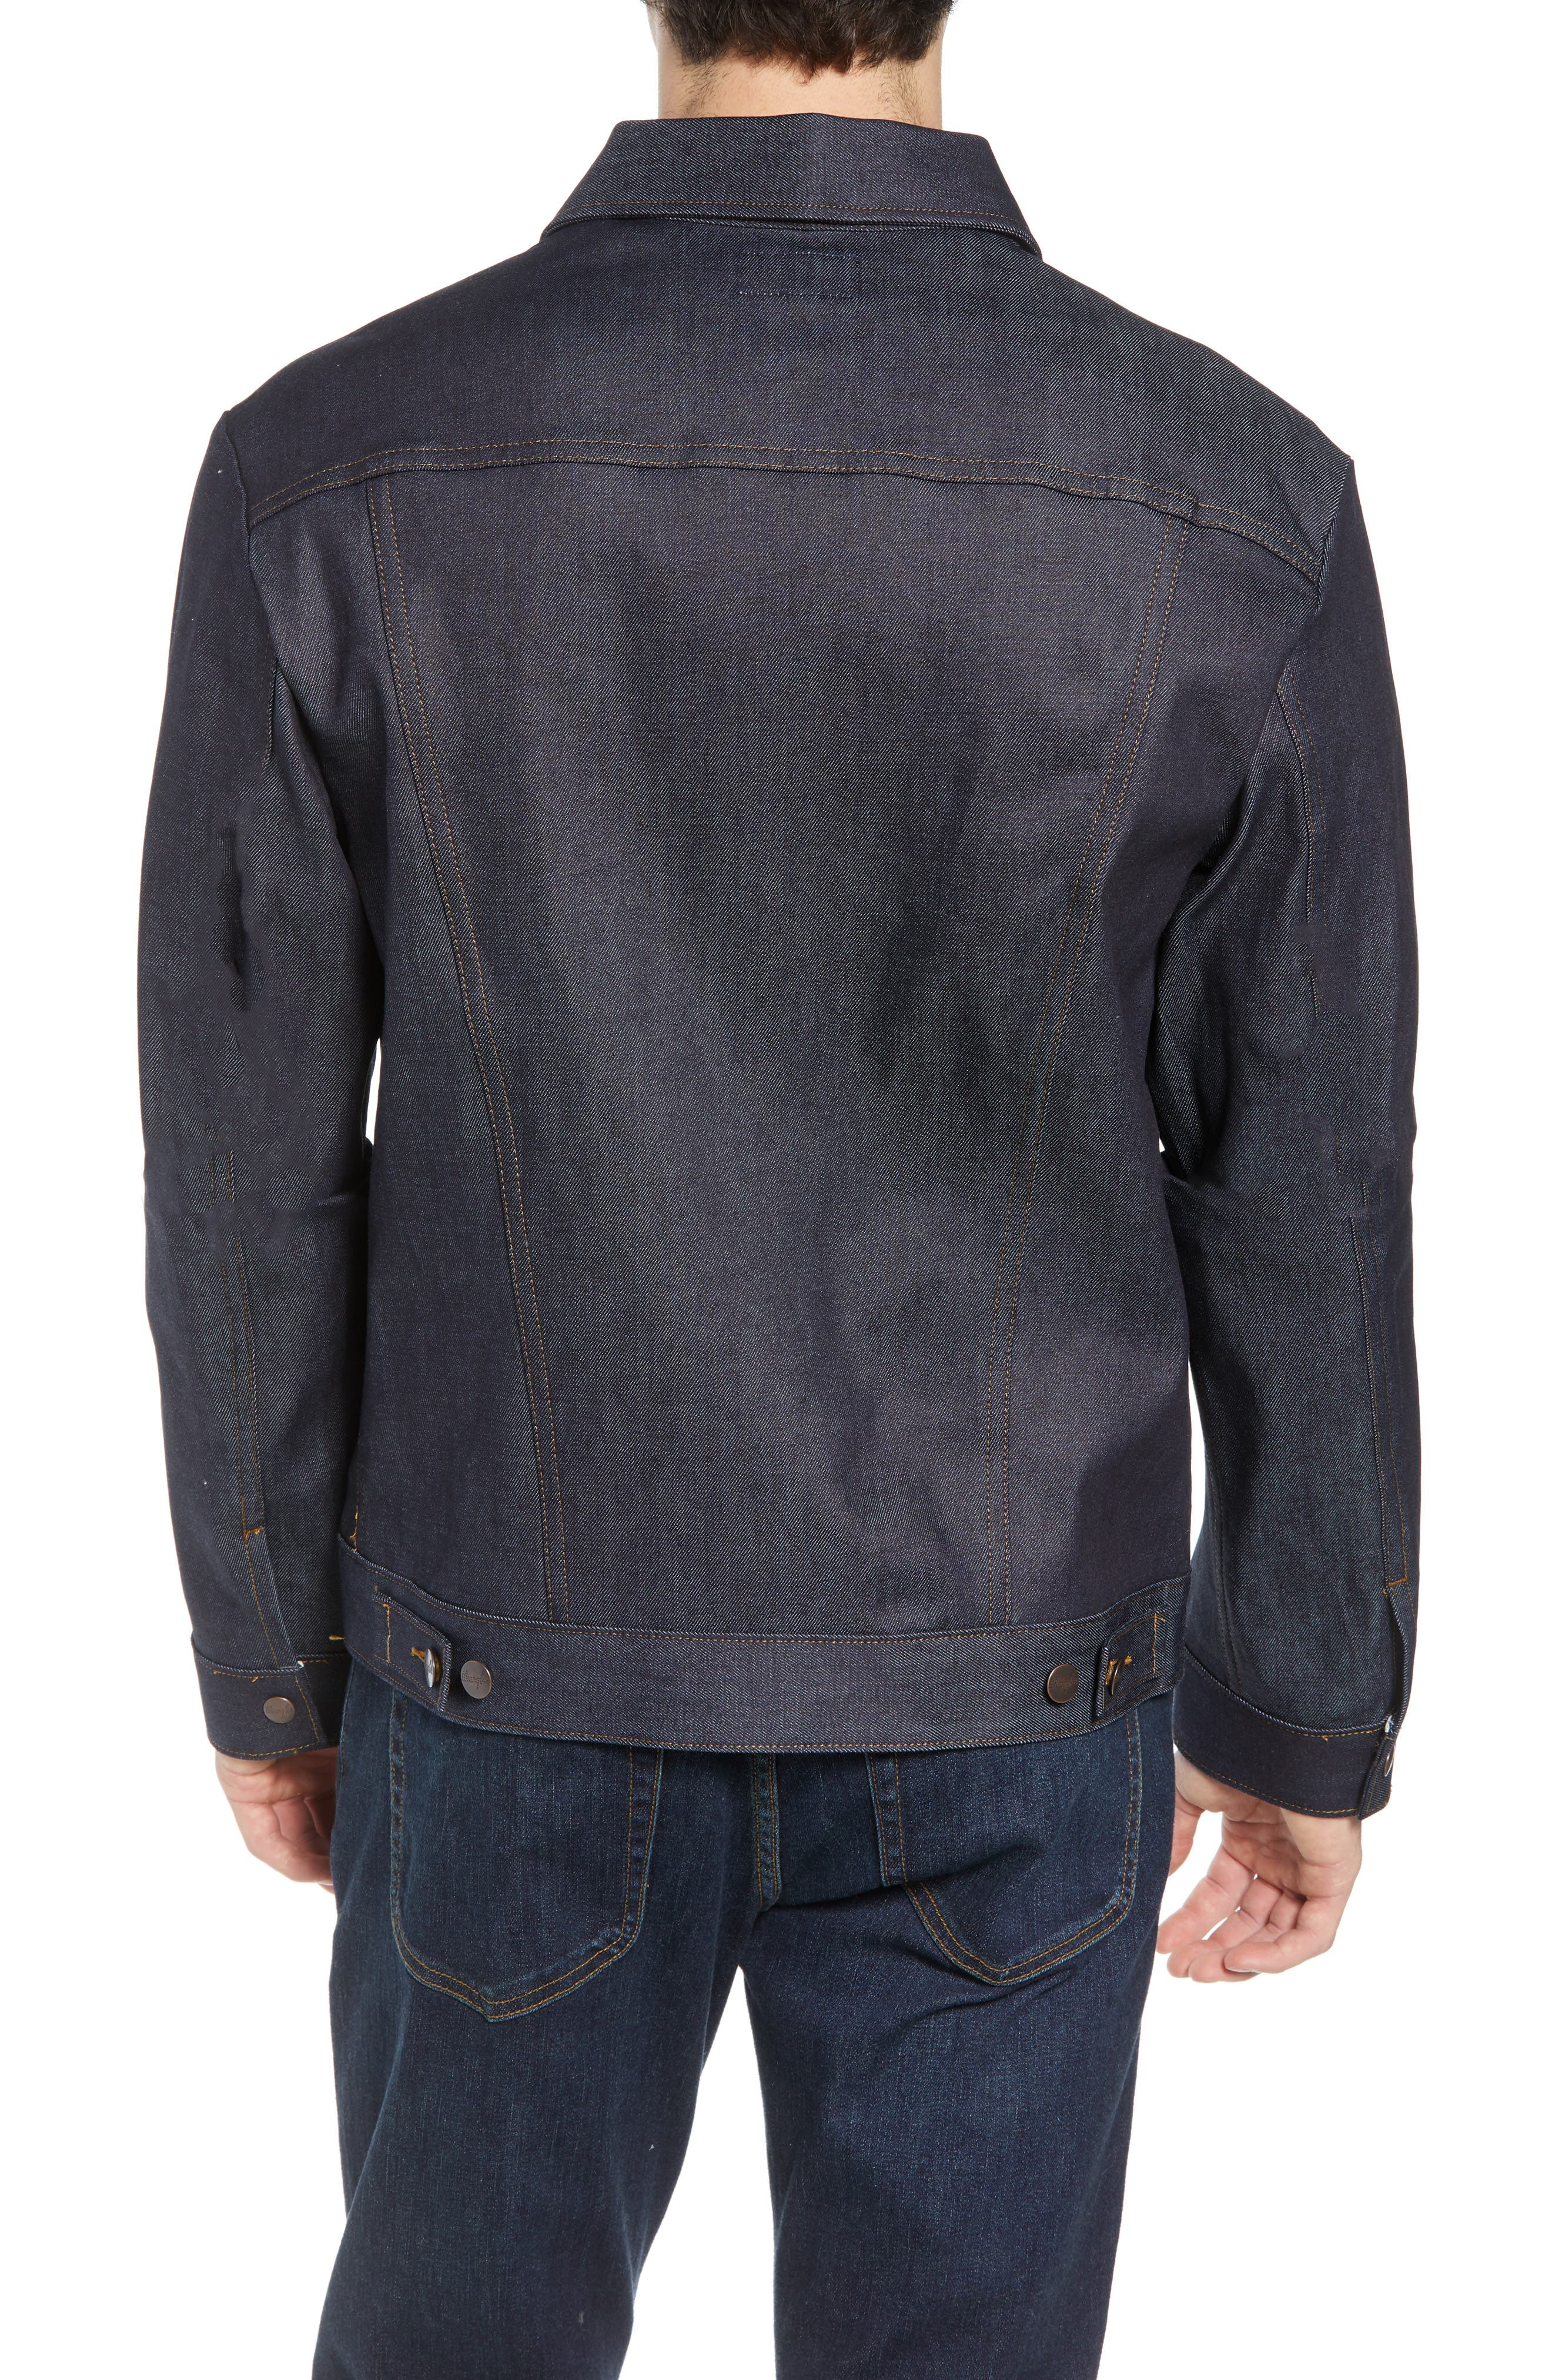 Heritage Denim Jacket,                             Alternate thumbnail 2, color,                             SELEVDGE RAW